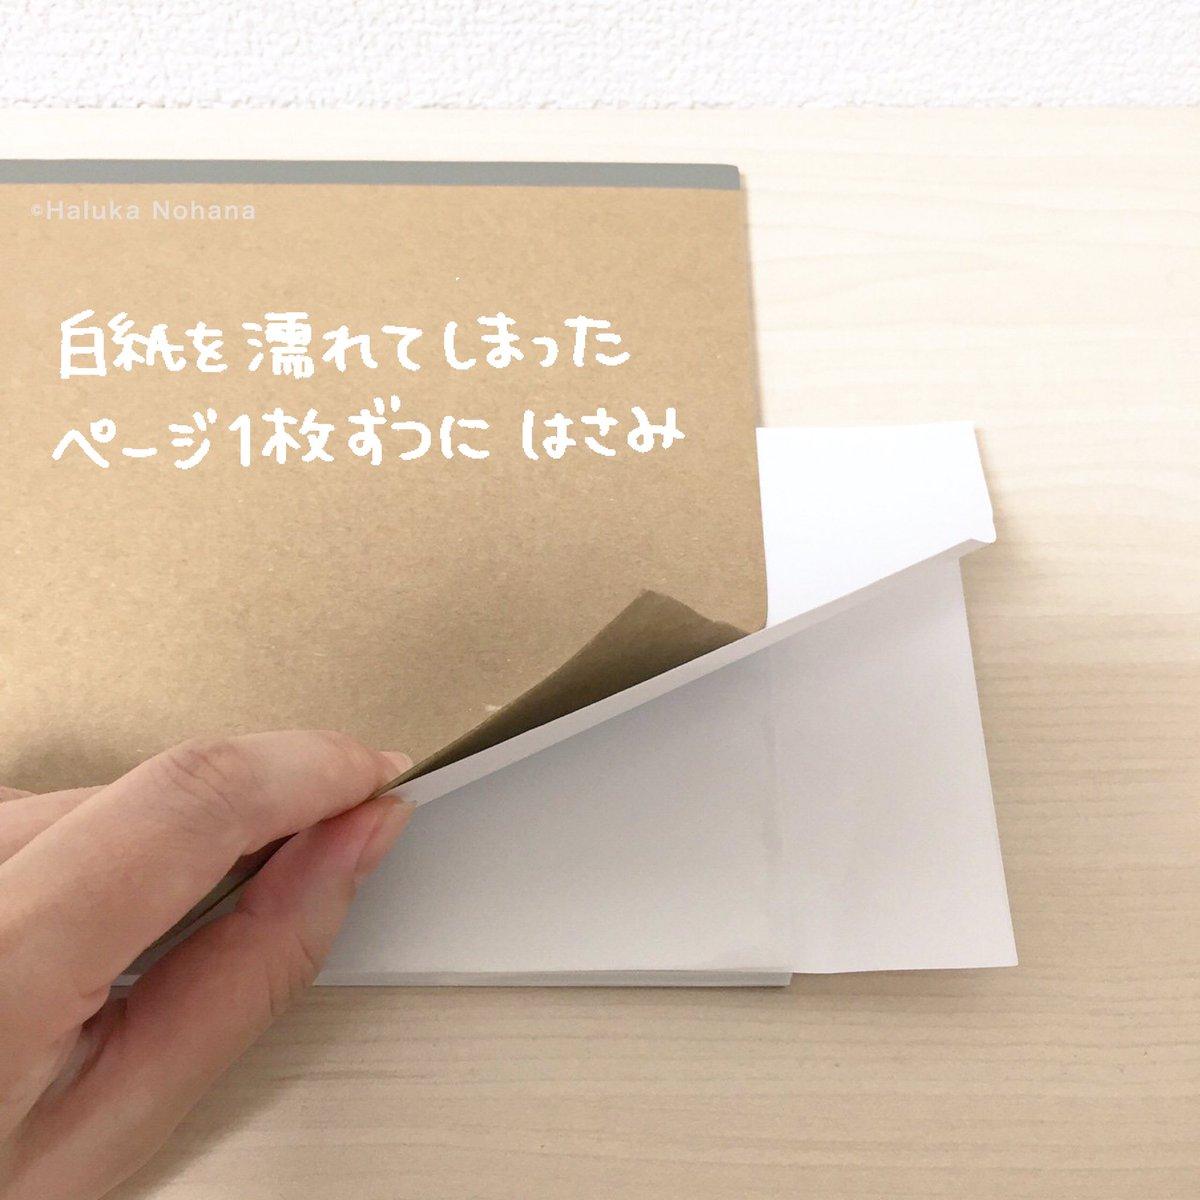 haruka-nohana-diy-fix-wet-book-pages-2